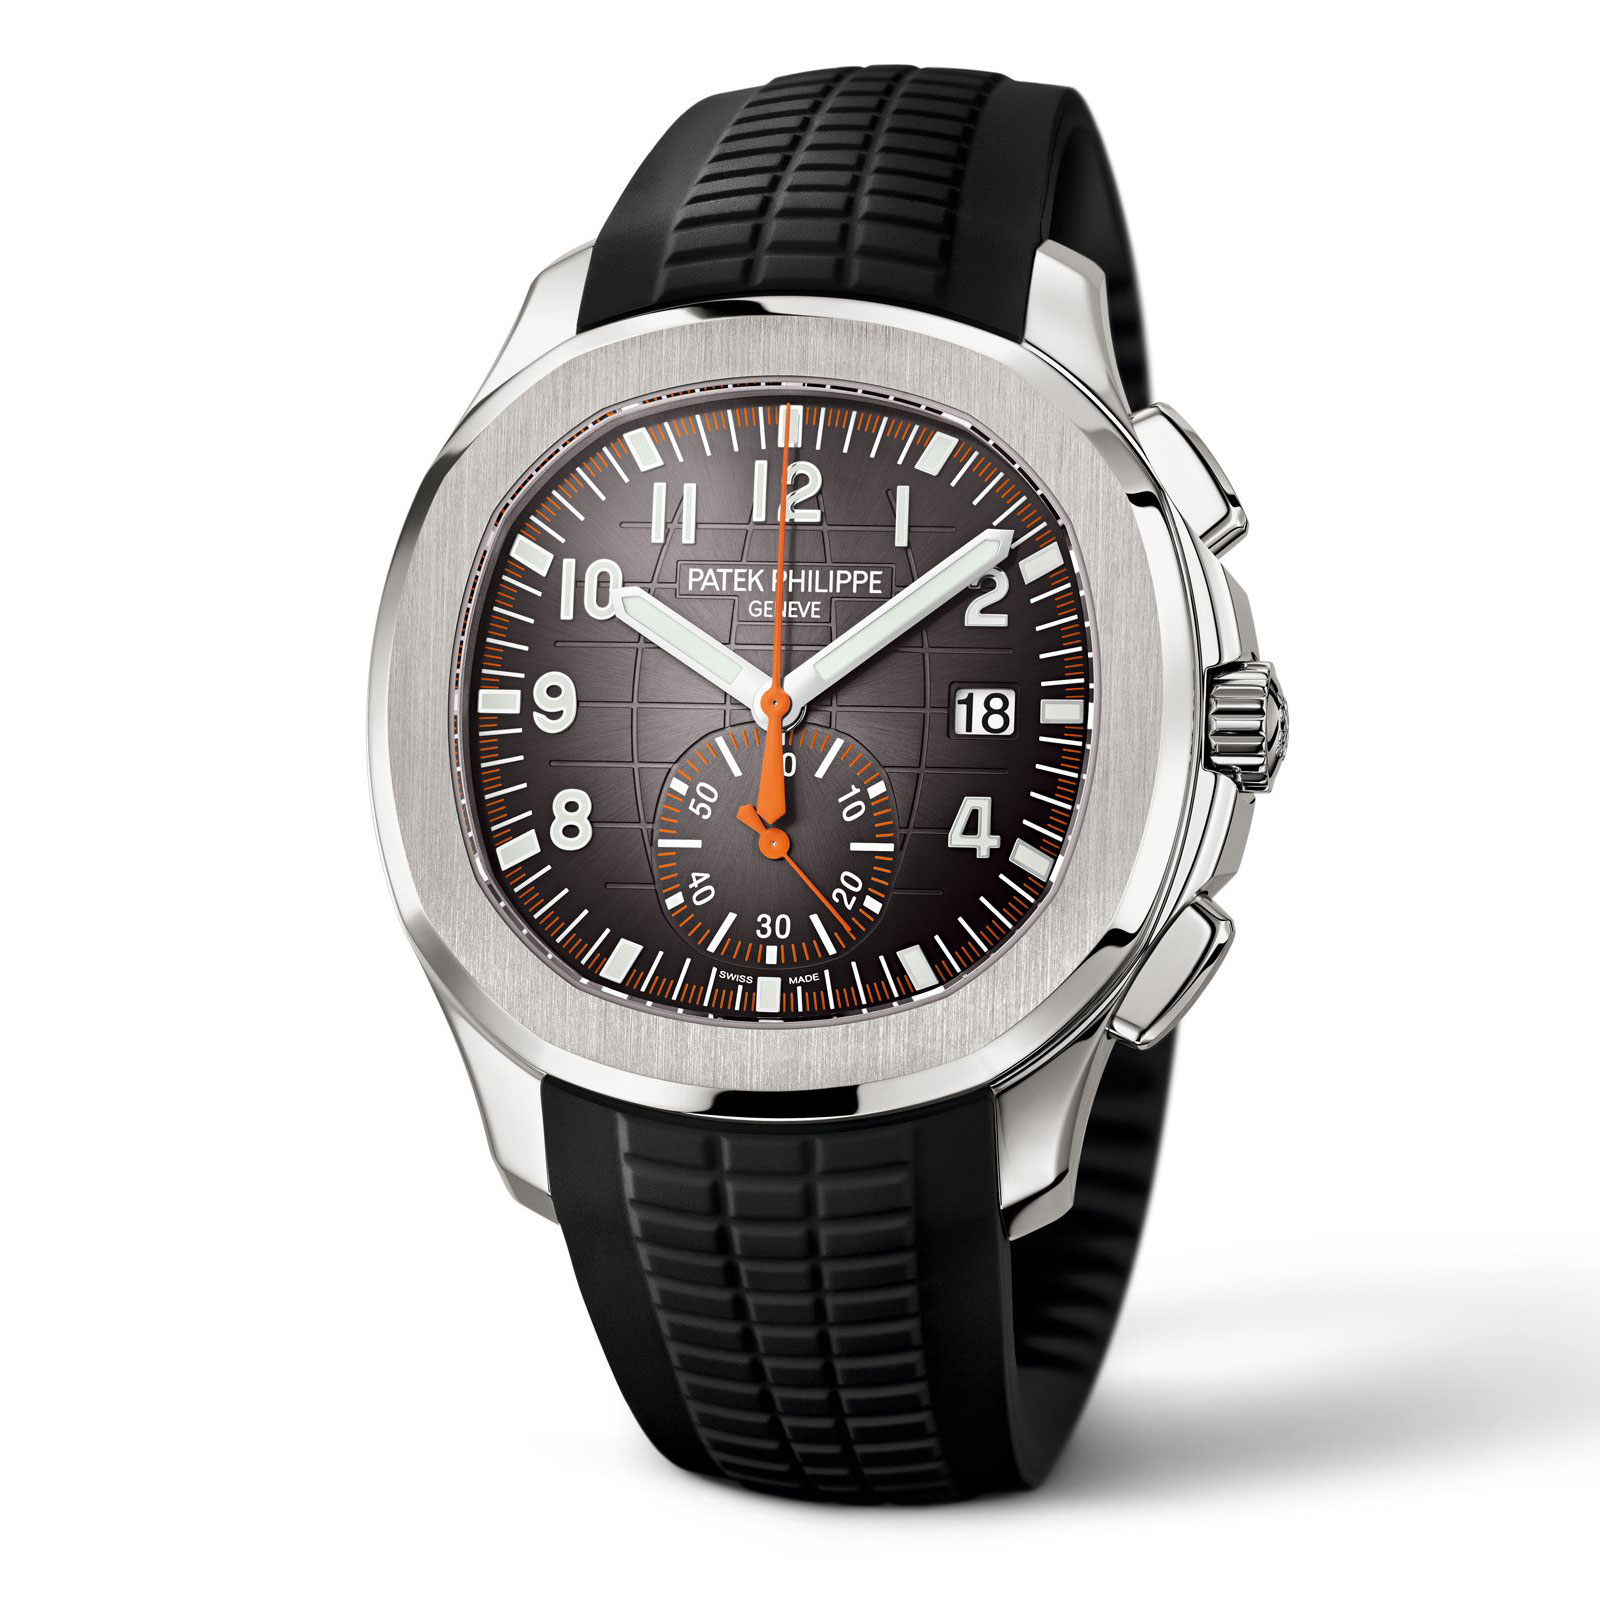 Patek Philippe Aquanaut Chronograph Ref. 5968A 2